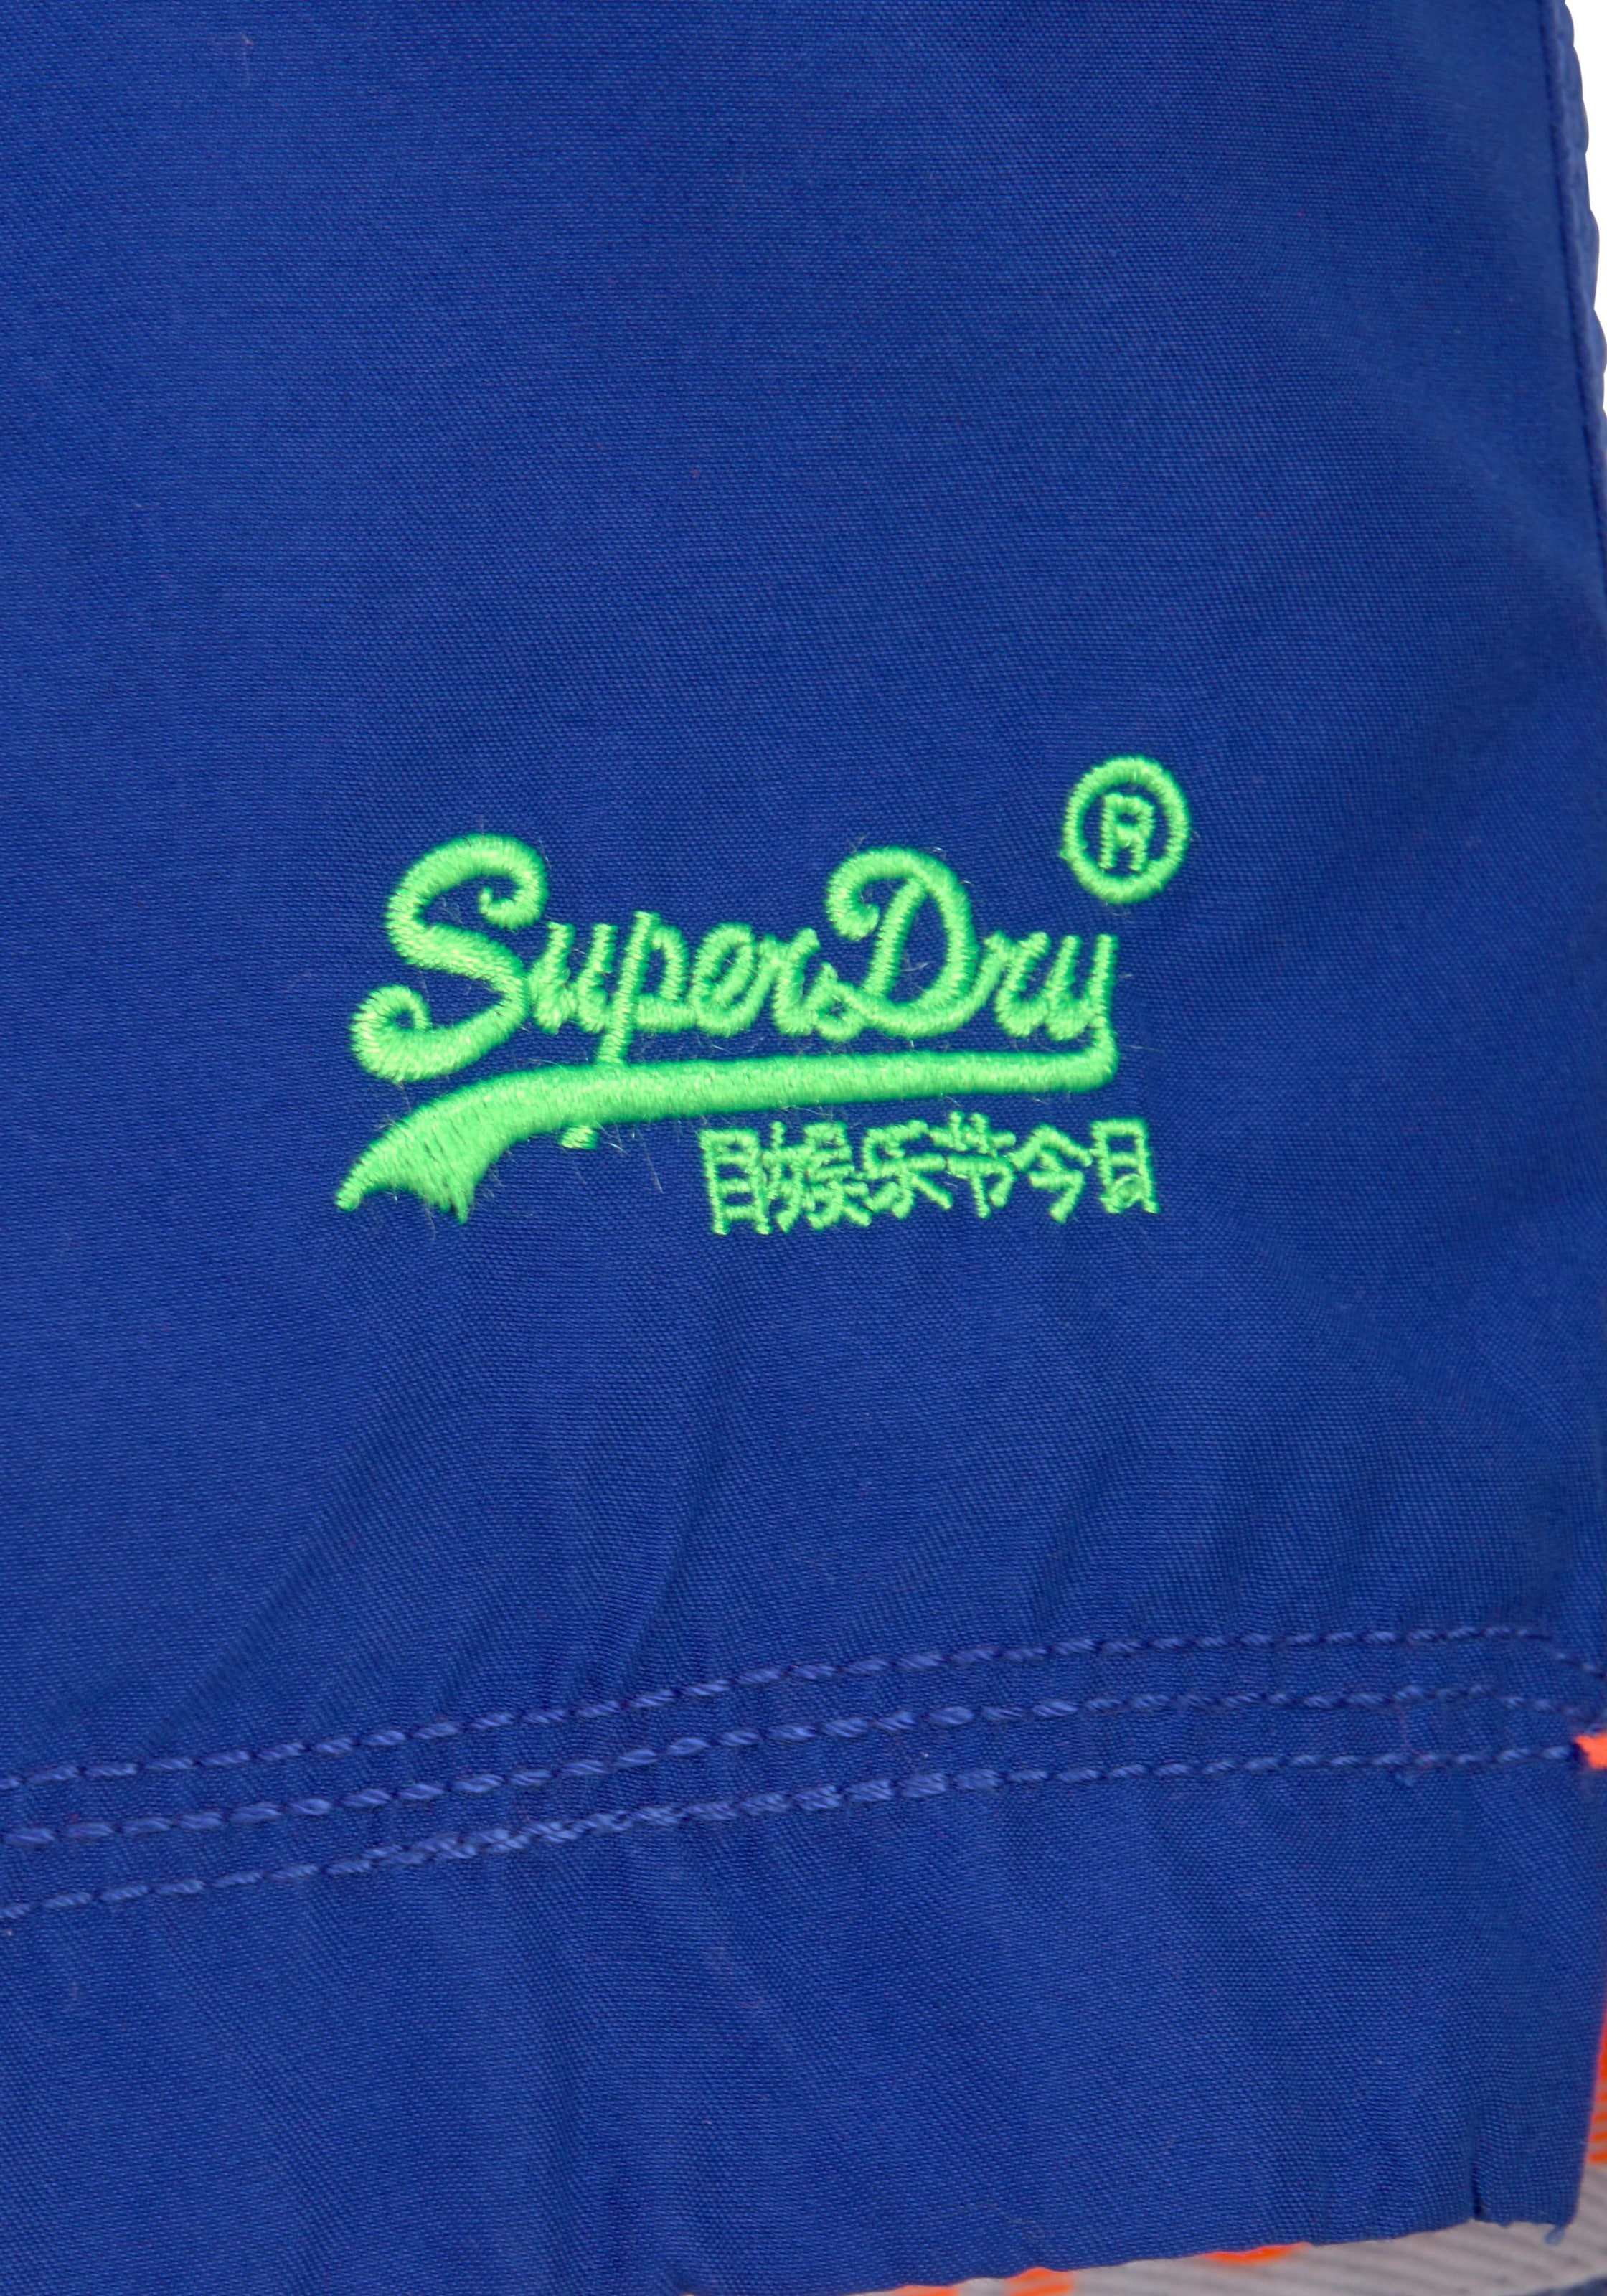 superdry rabattcode